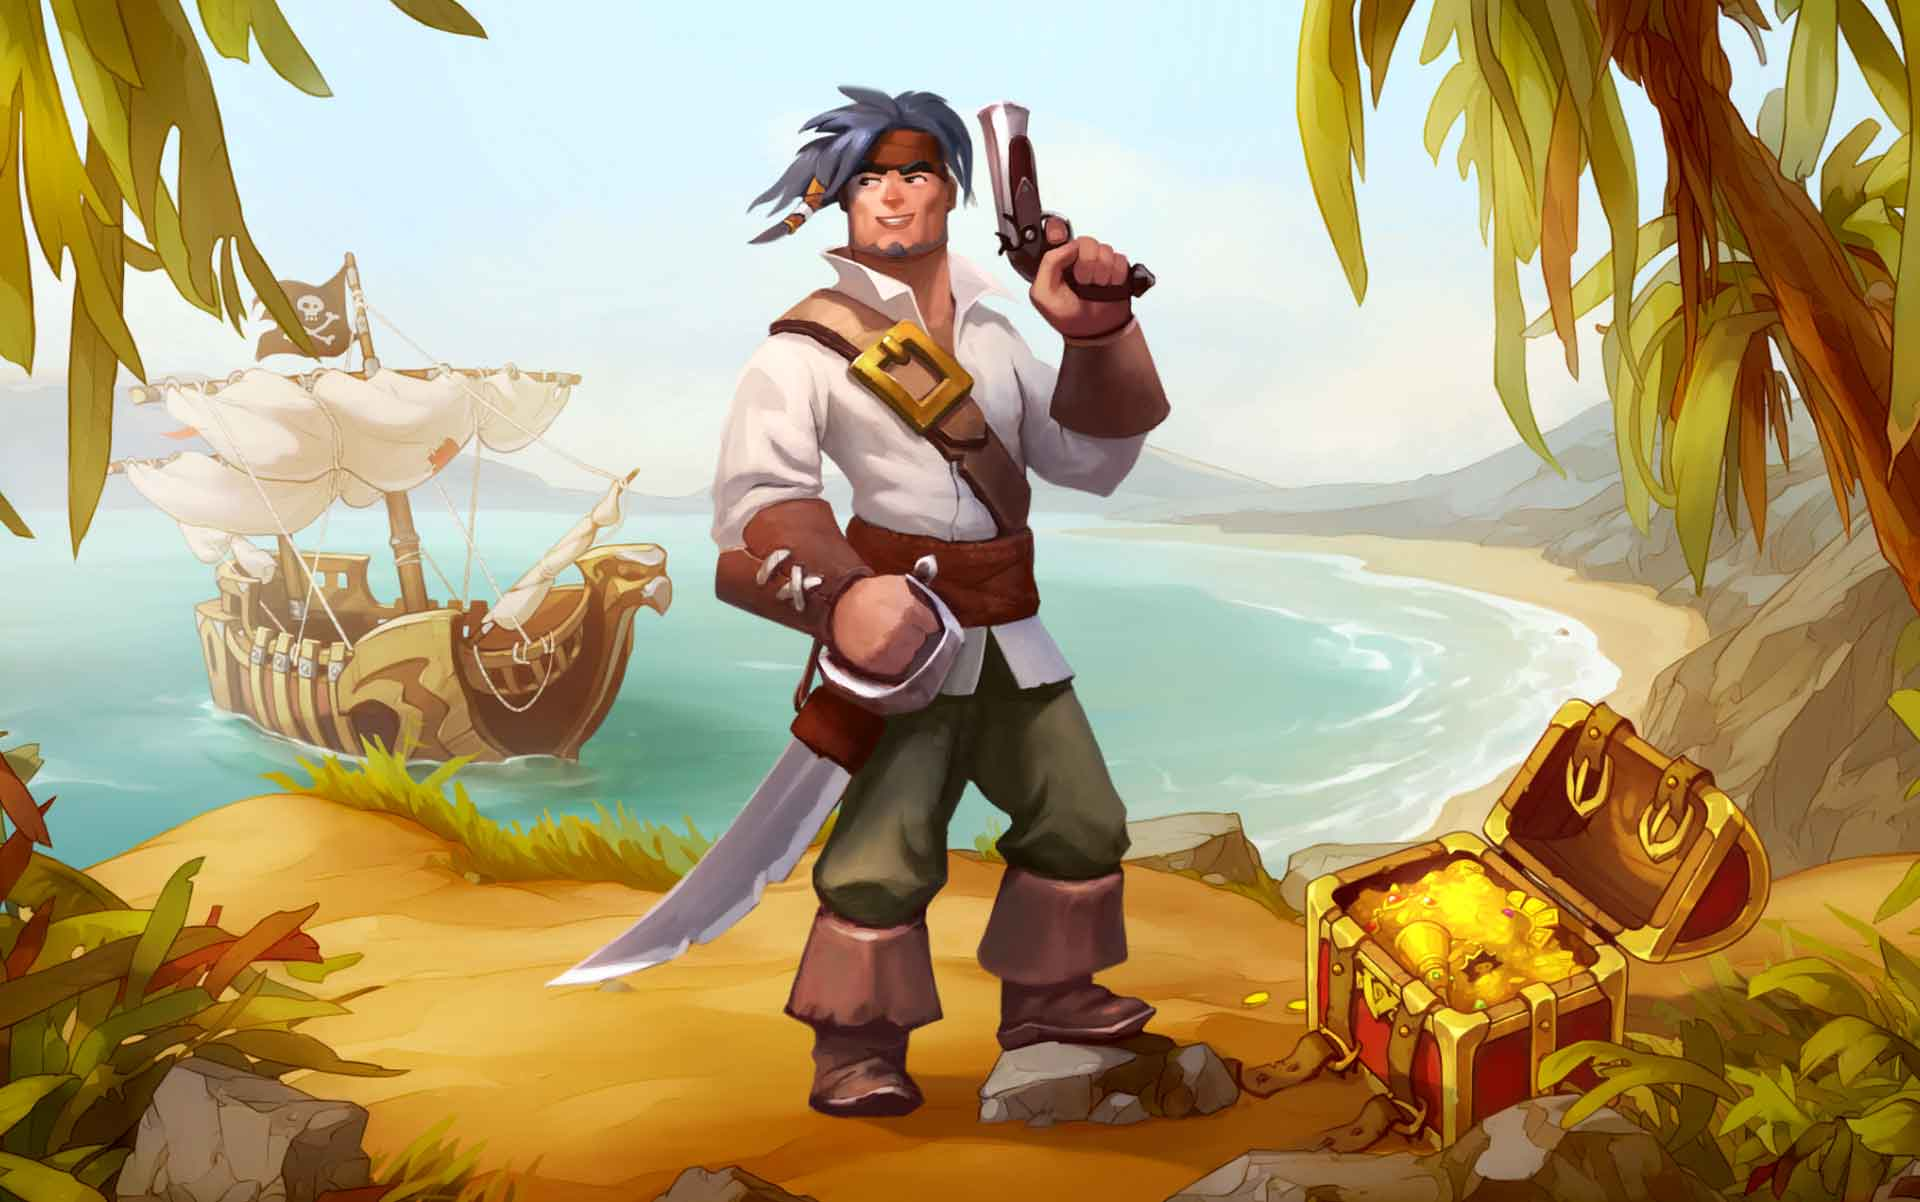 Land ho! Braveland Pirate awaits!